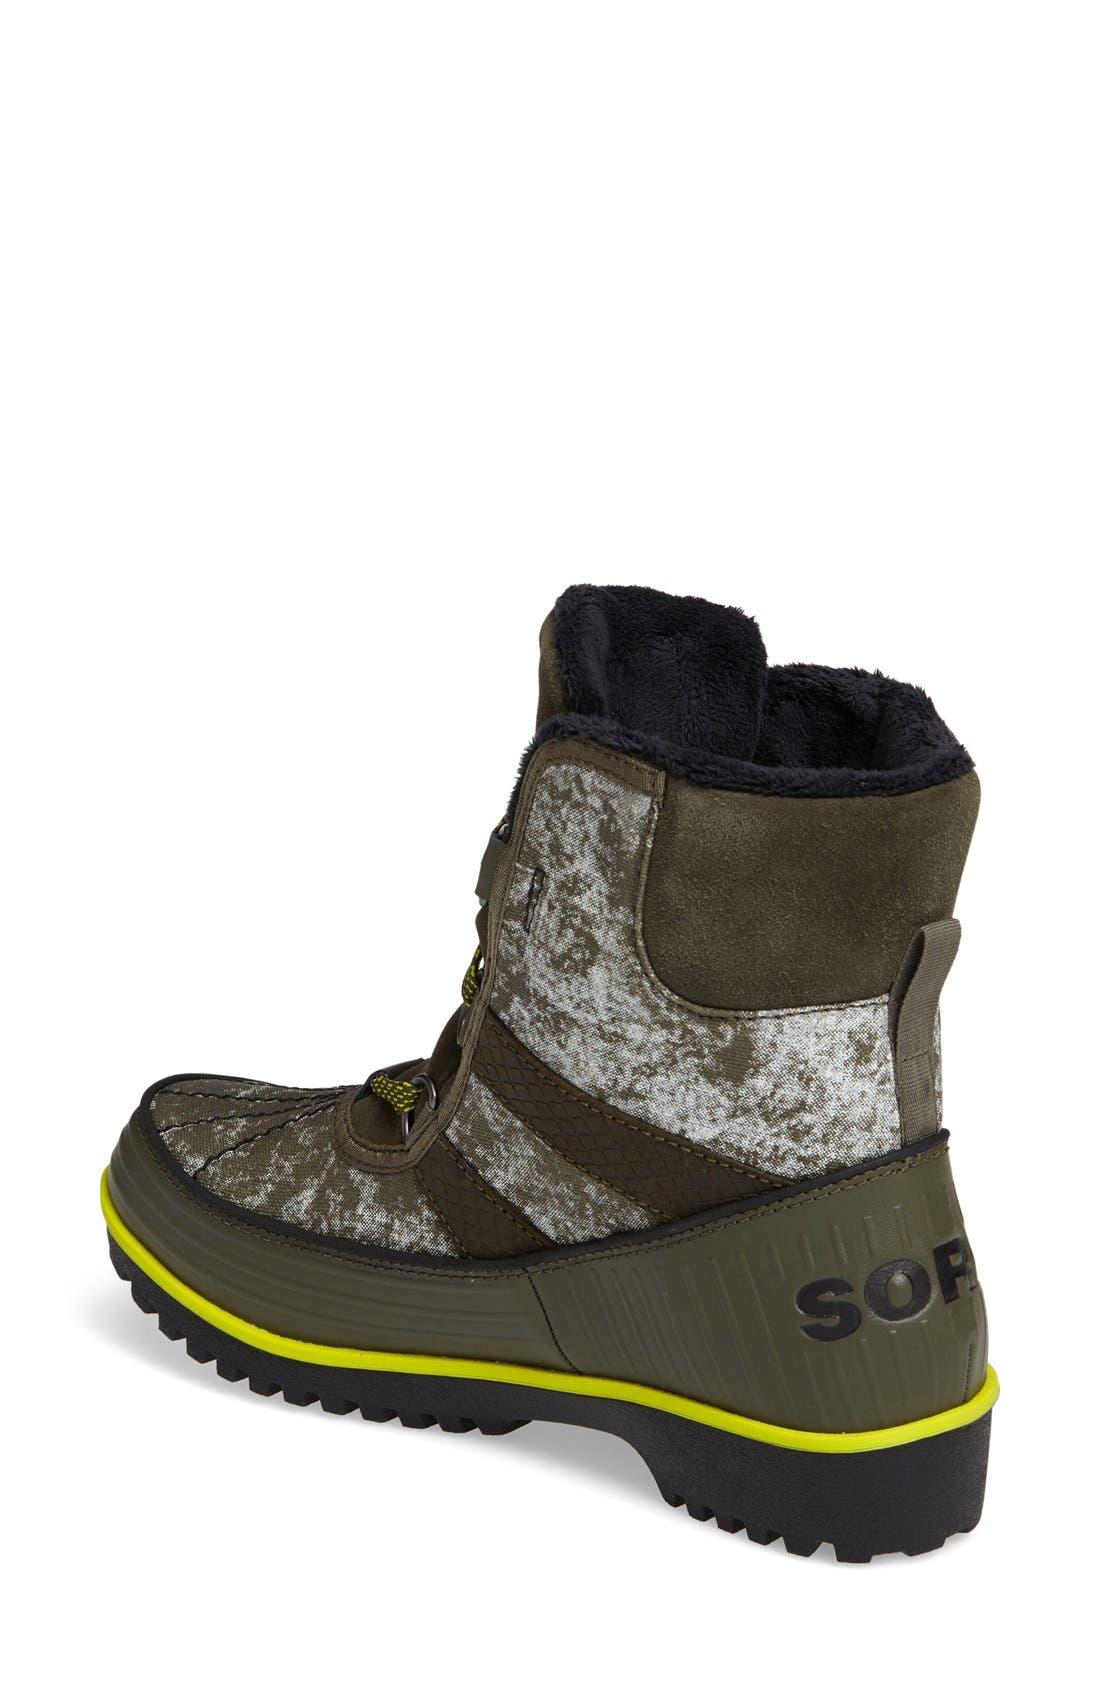 'Tivoli II' Waterproof Boot,                             Alternate thumbnail 19, color,